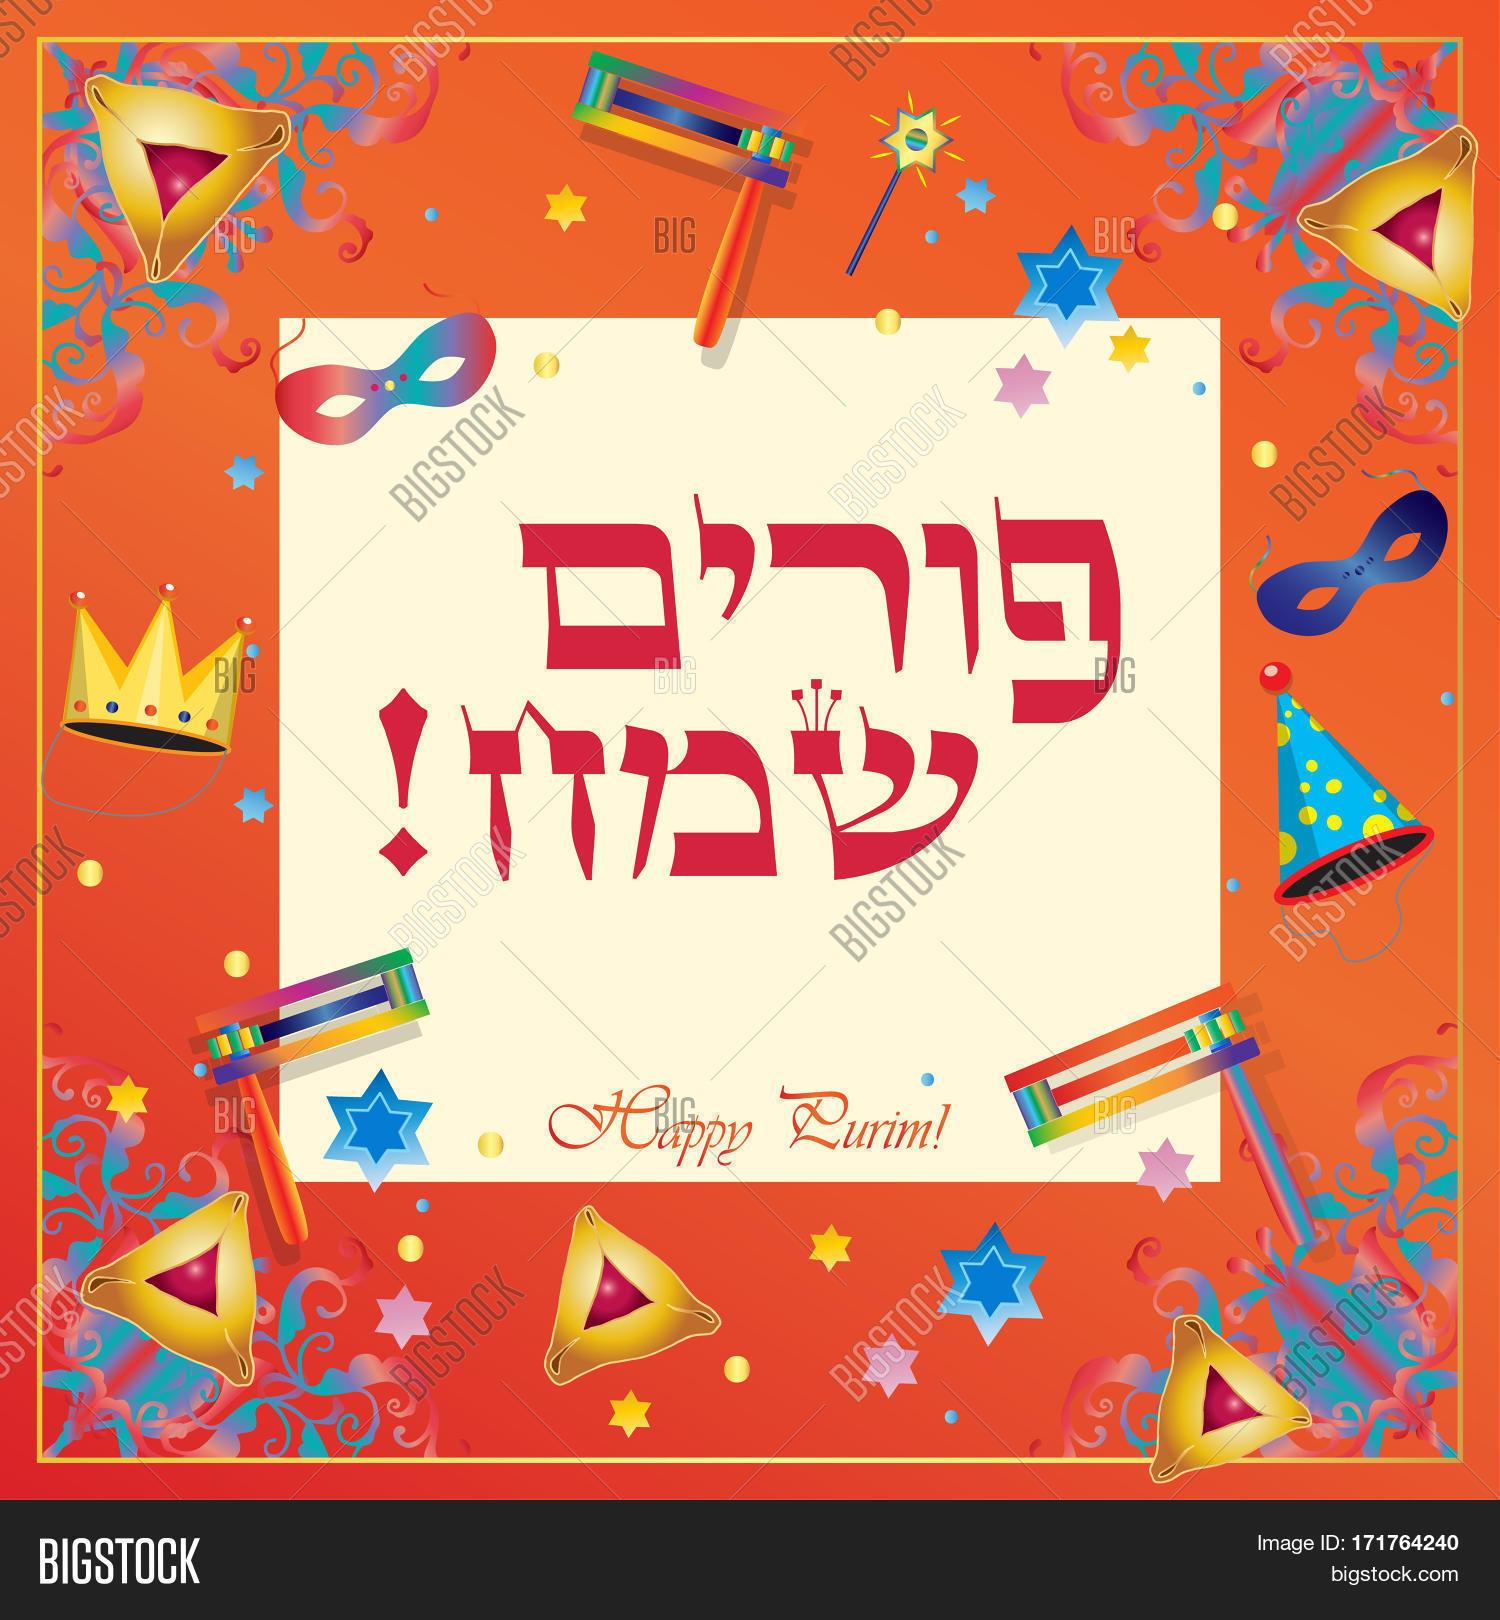 Happy purim festival image photo free trial bigstock happy purim festival greeting card frame translation from hebrew happy purim purim jewish m4hsunfo